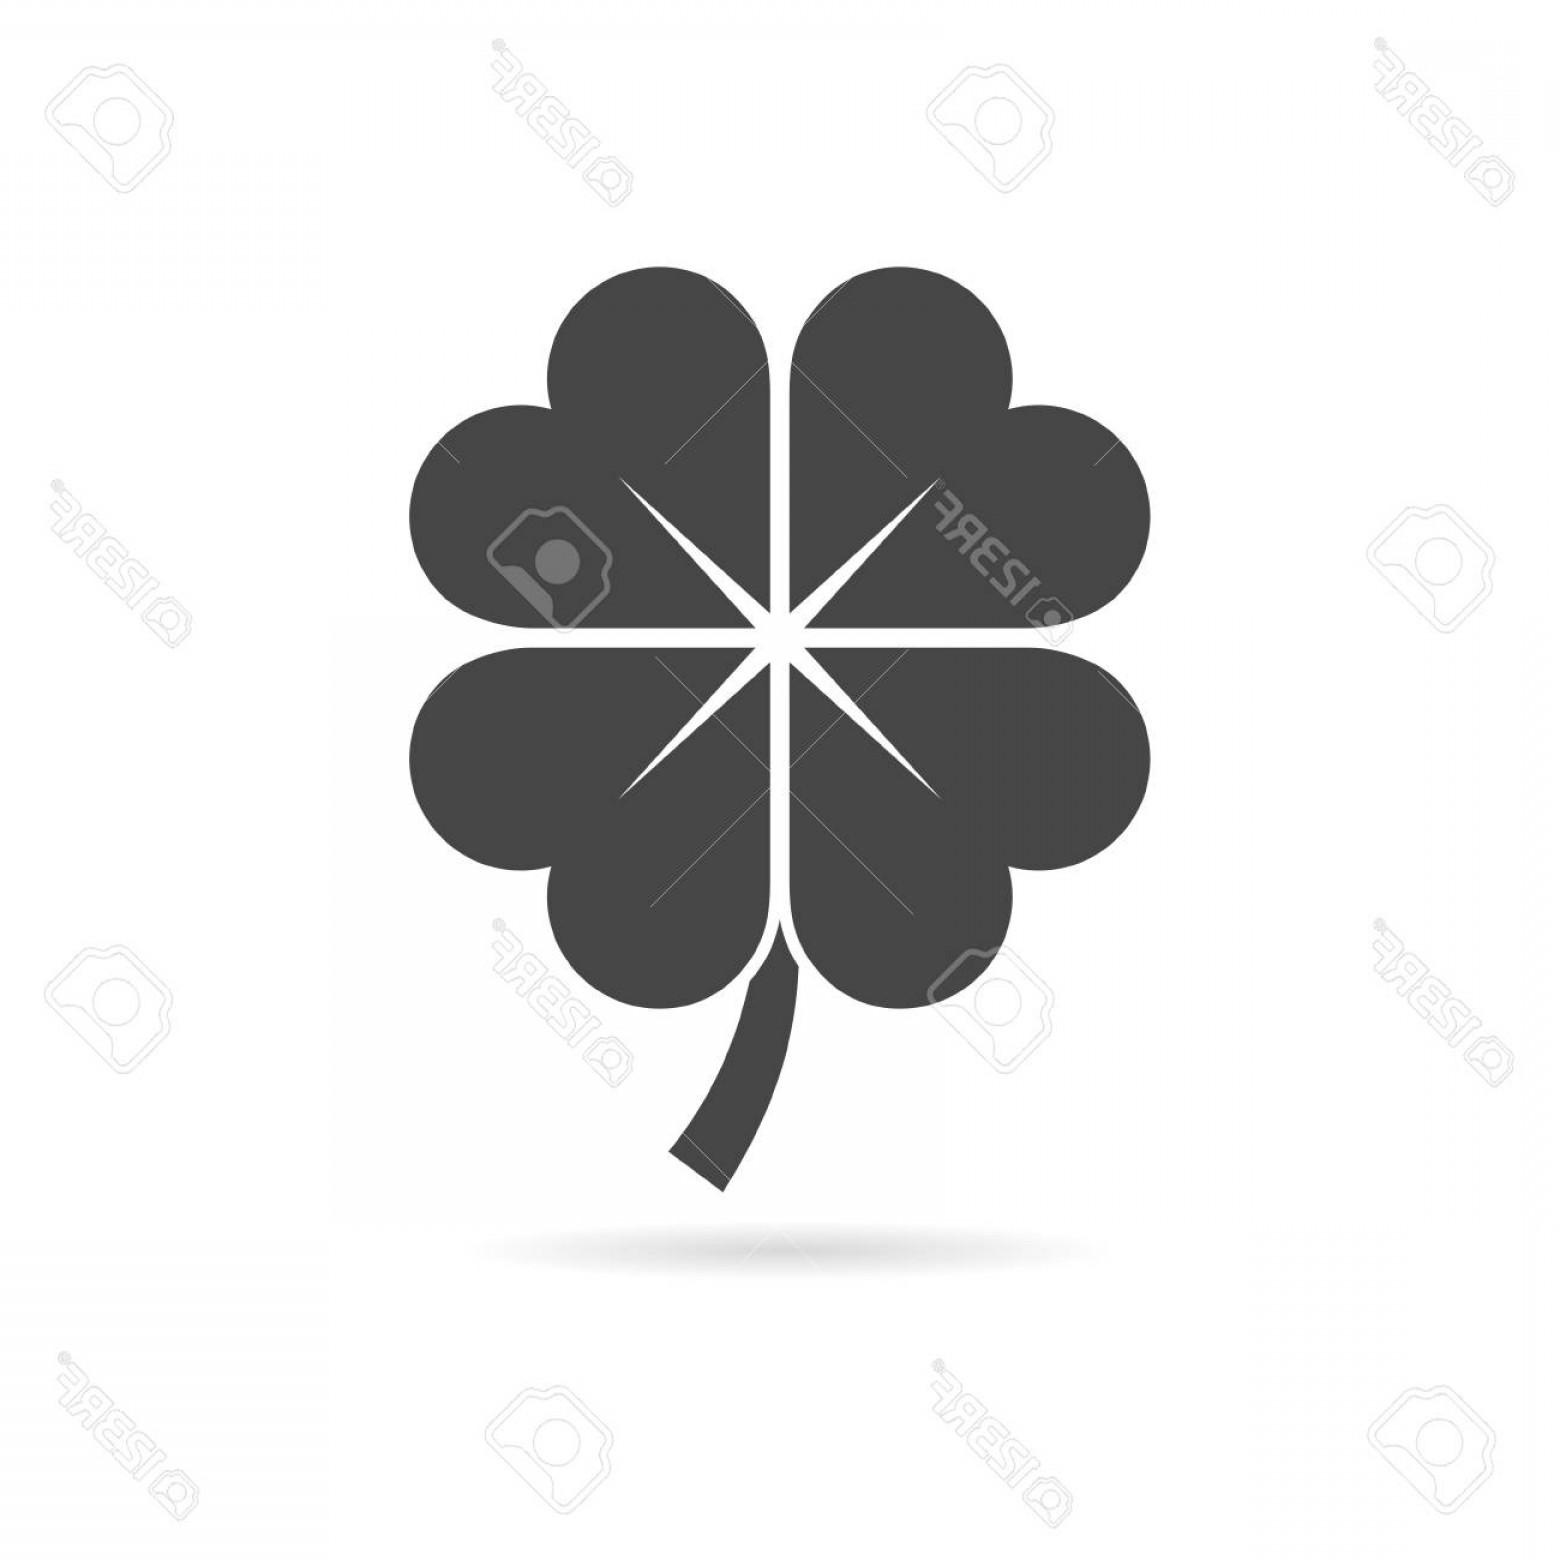 1560x1560 Philies 4 Leaf Clover Vector Orangiausa